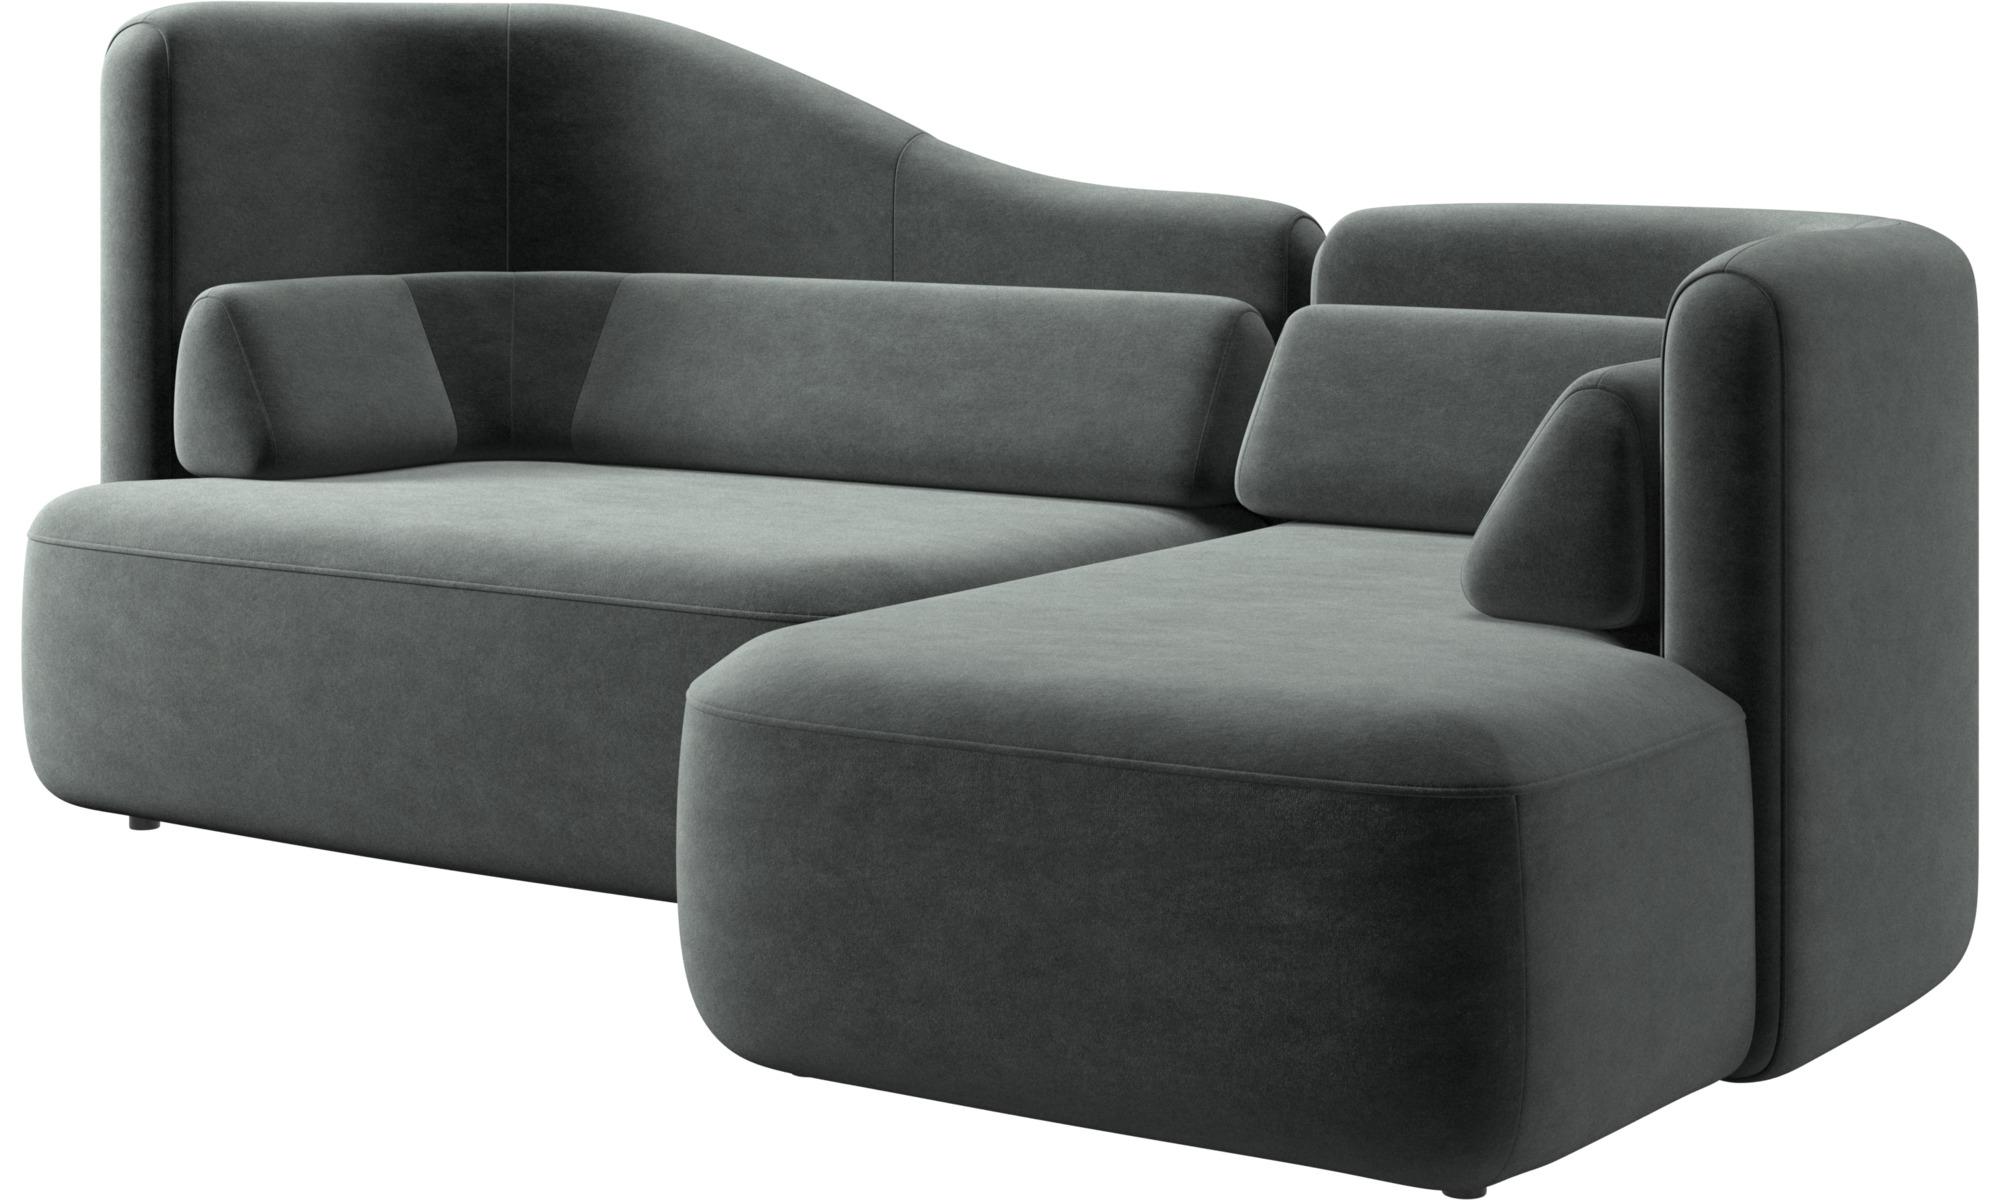 condo sized sectional sofa ottawa 123 co uk reviews model brabbu cgtrader thesofa